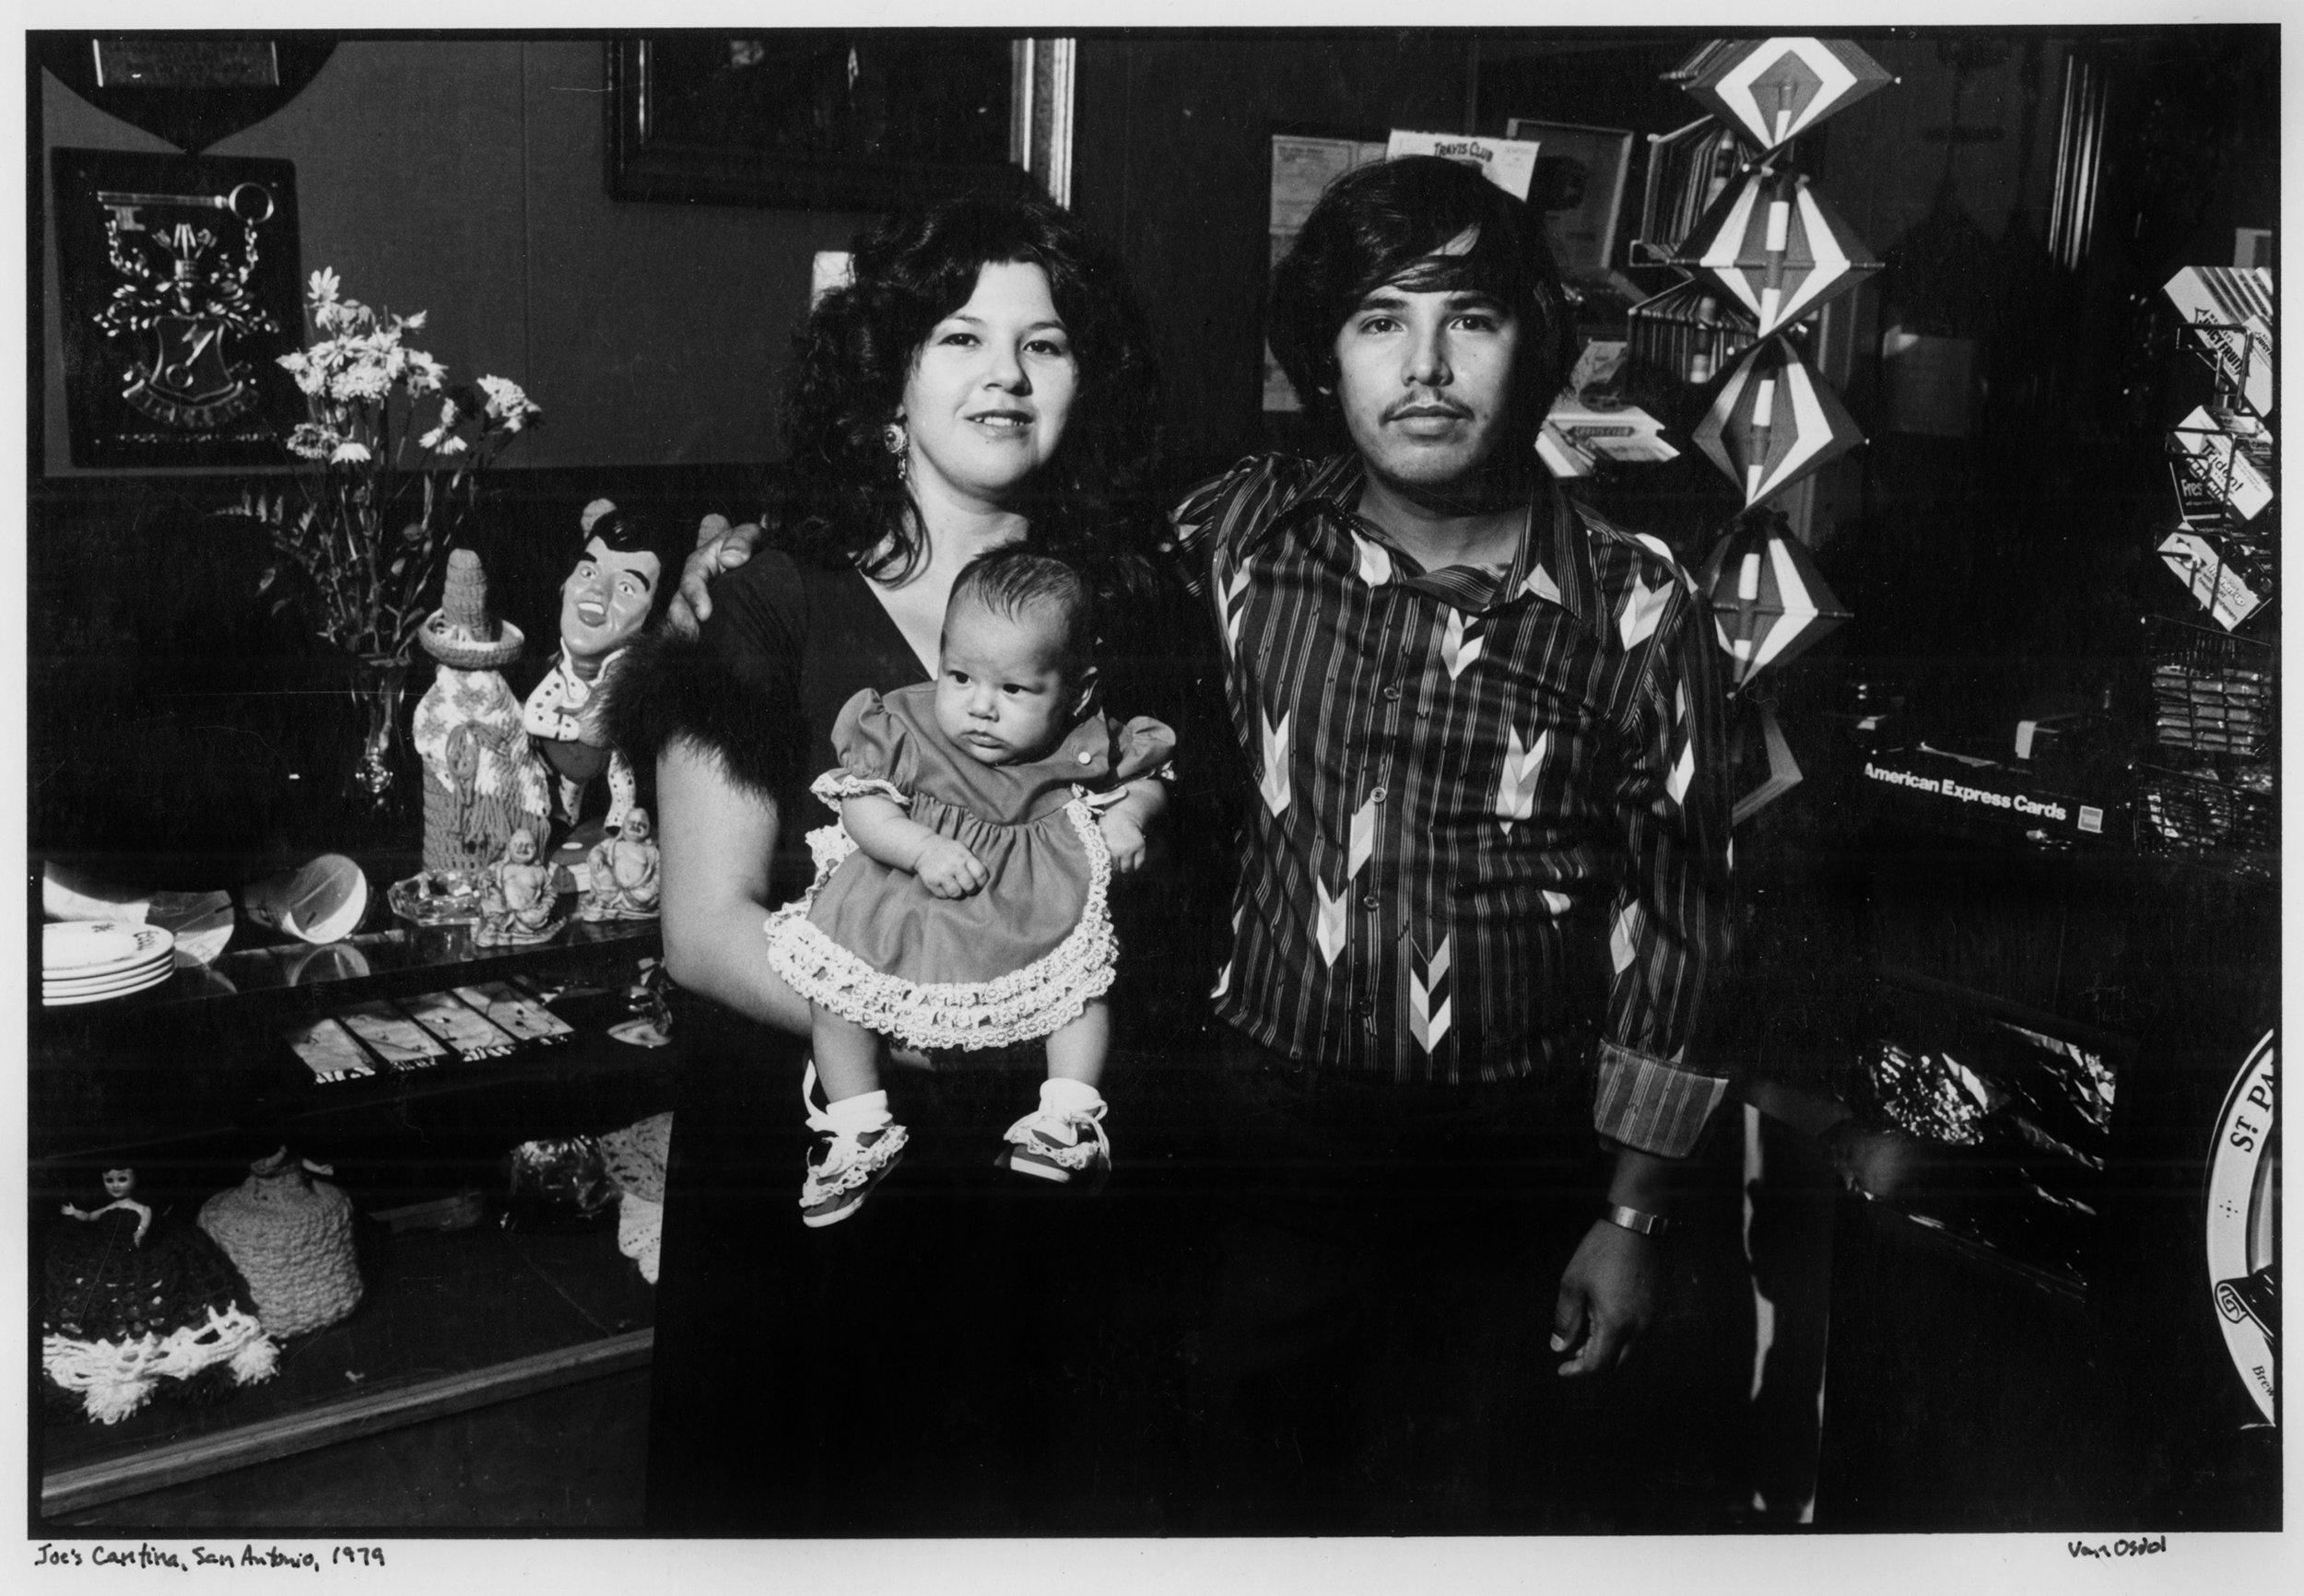 Joe's Cantina, San Antonio, 1979